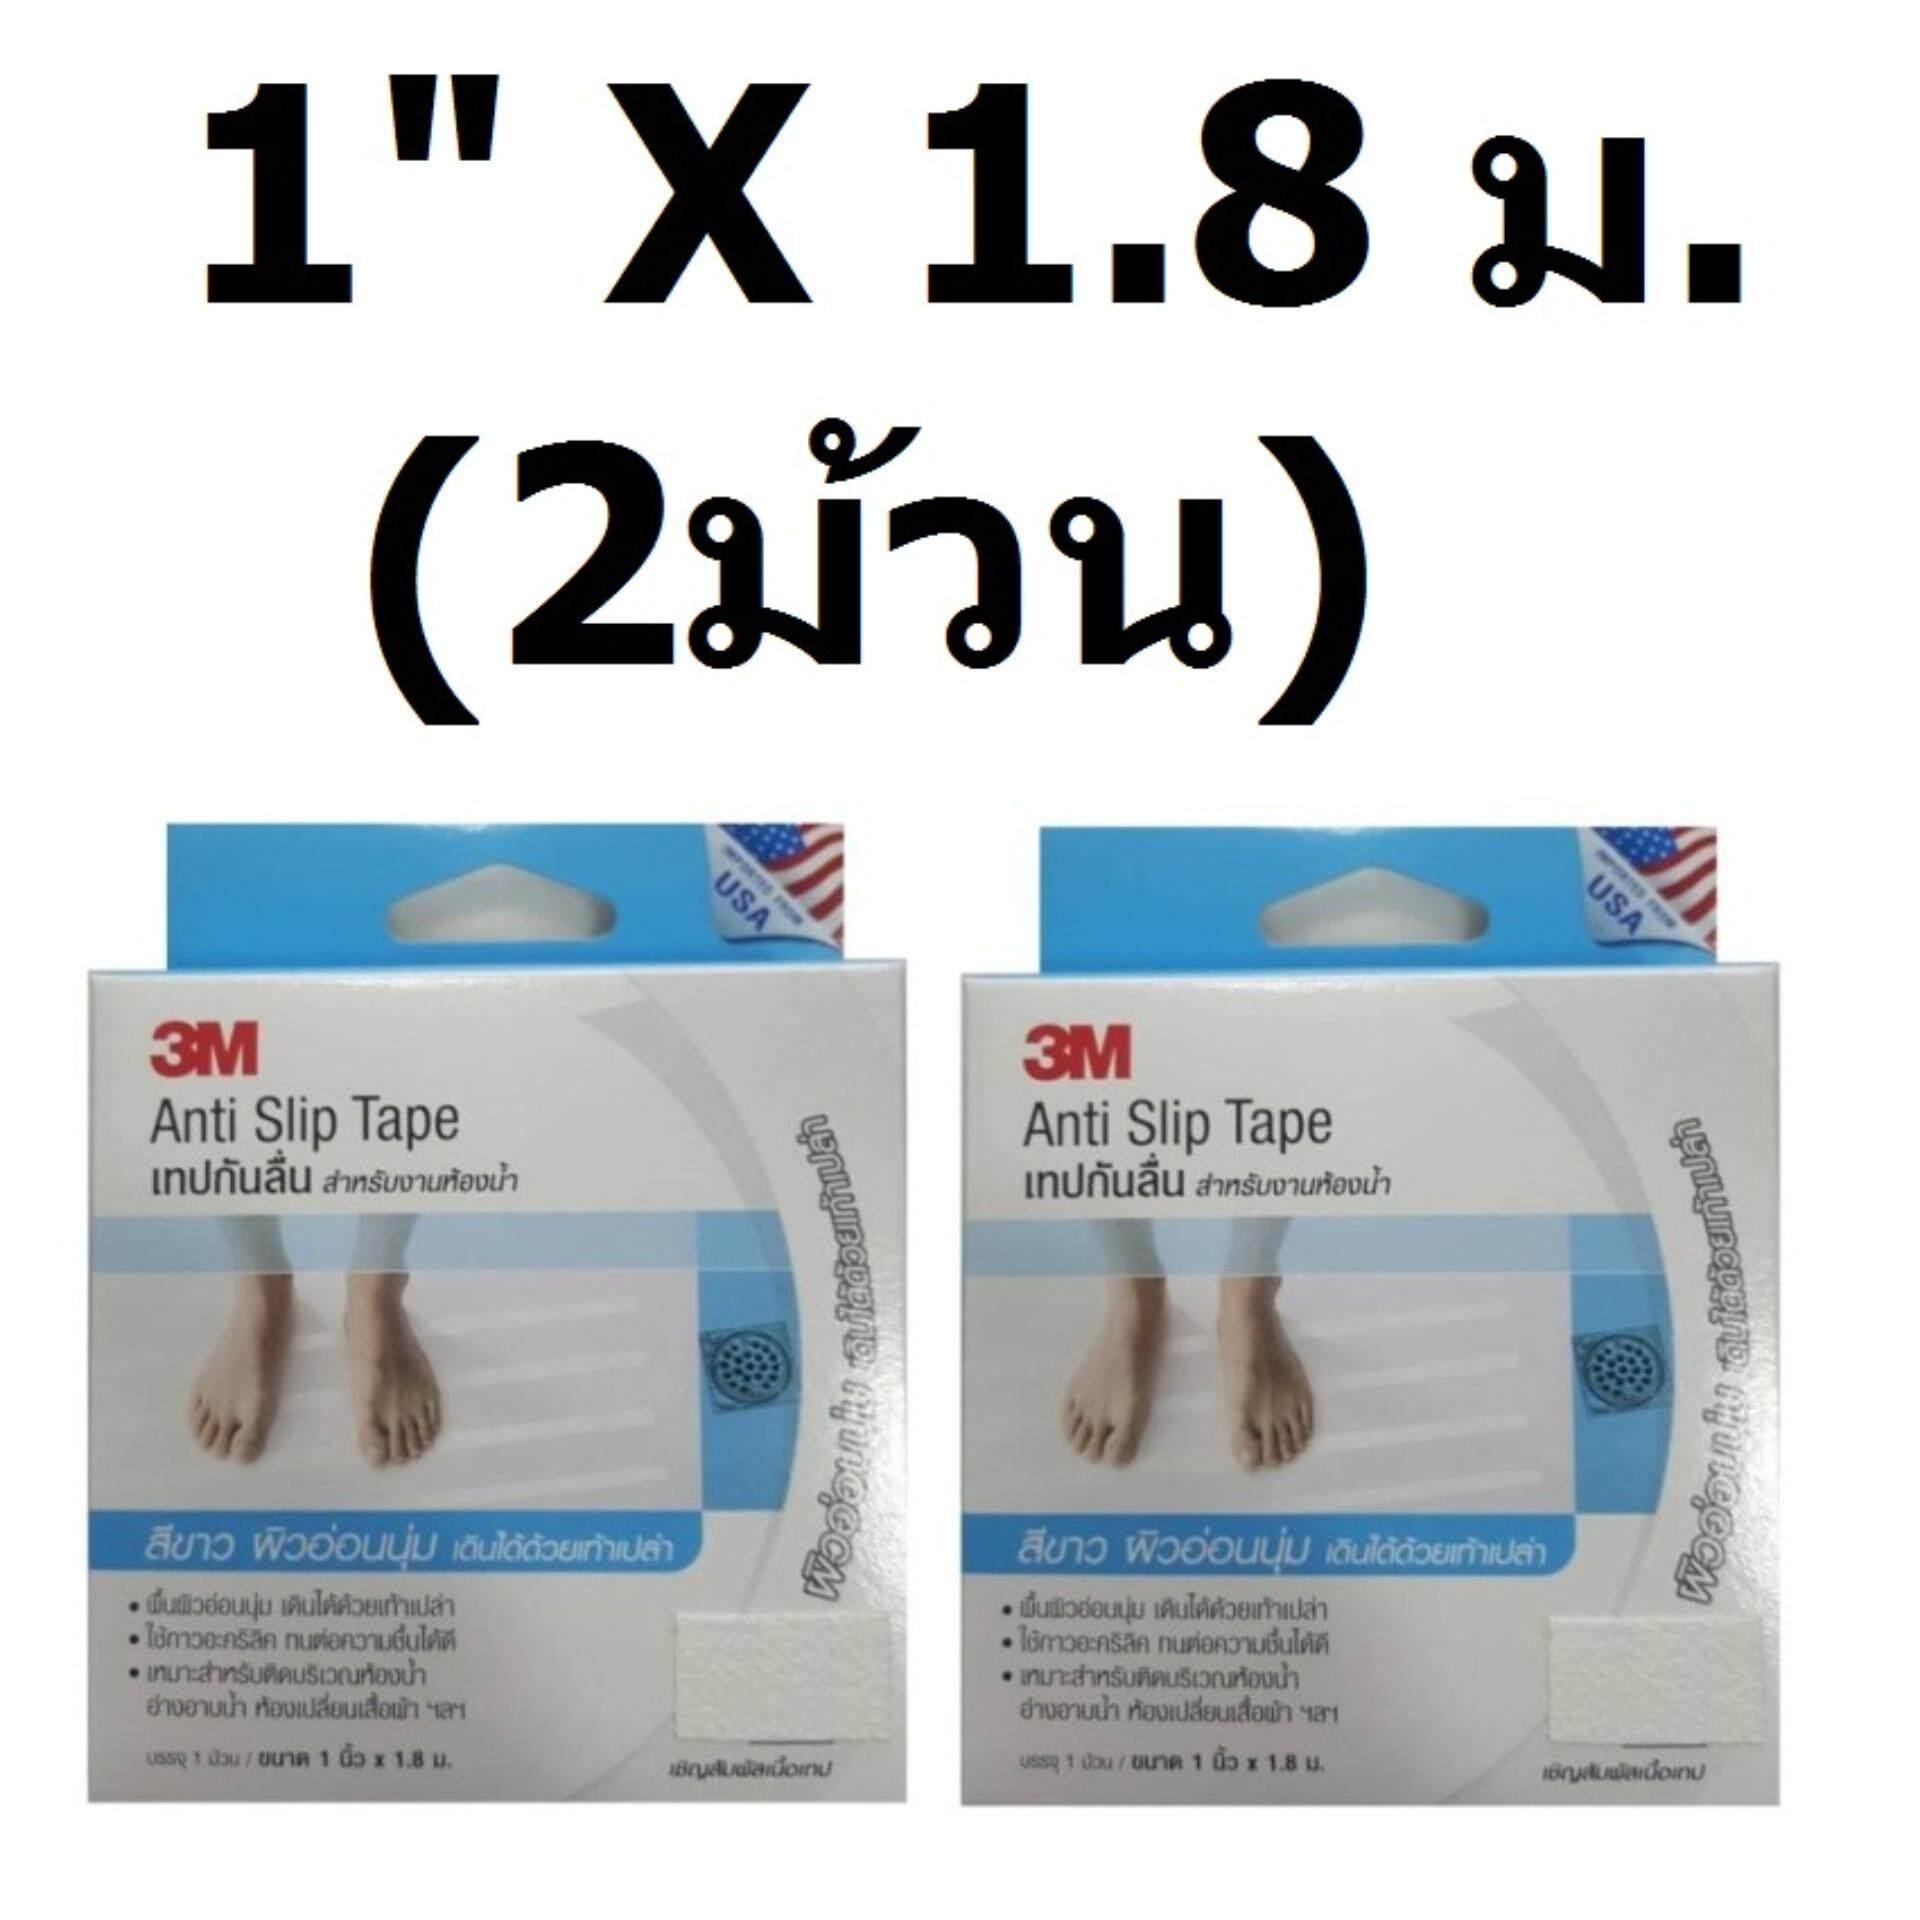 3M Anti-Slip Tape Light Duty White เทปกันลื่นชนิดม้วน สีขาว 1\ X 1.8 ม. (2ม้วน)